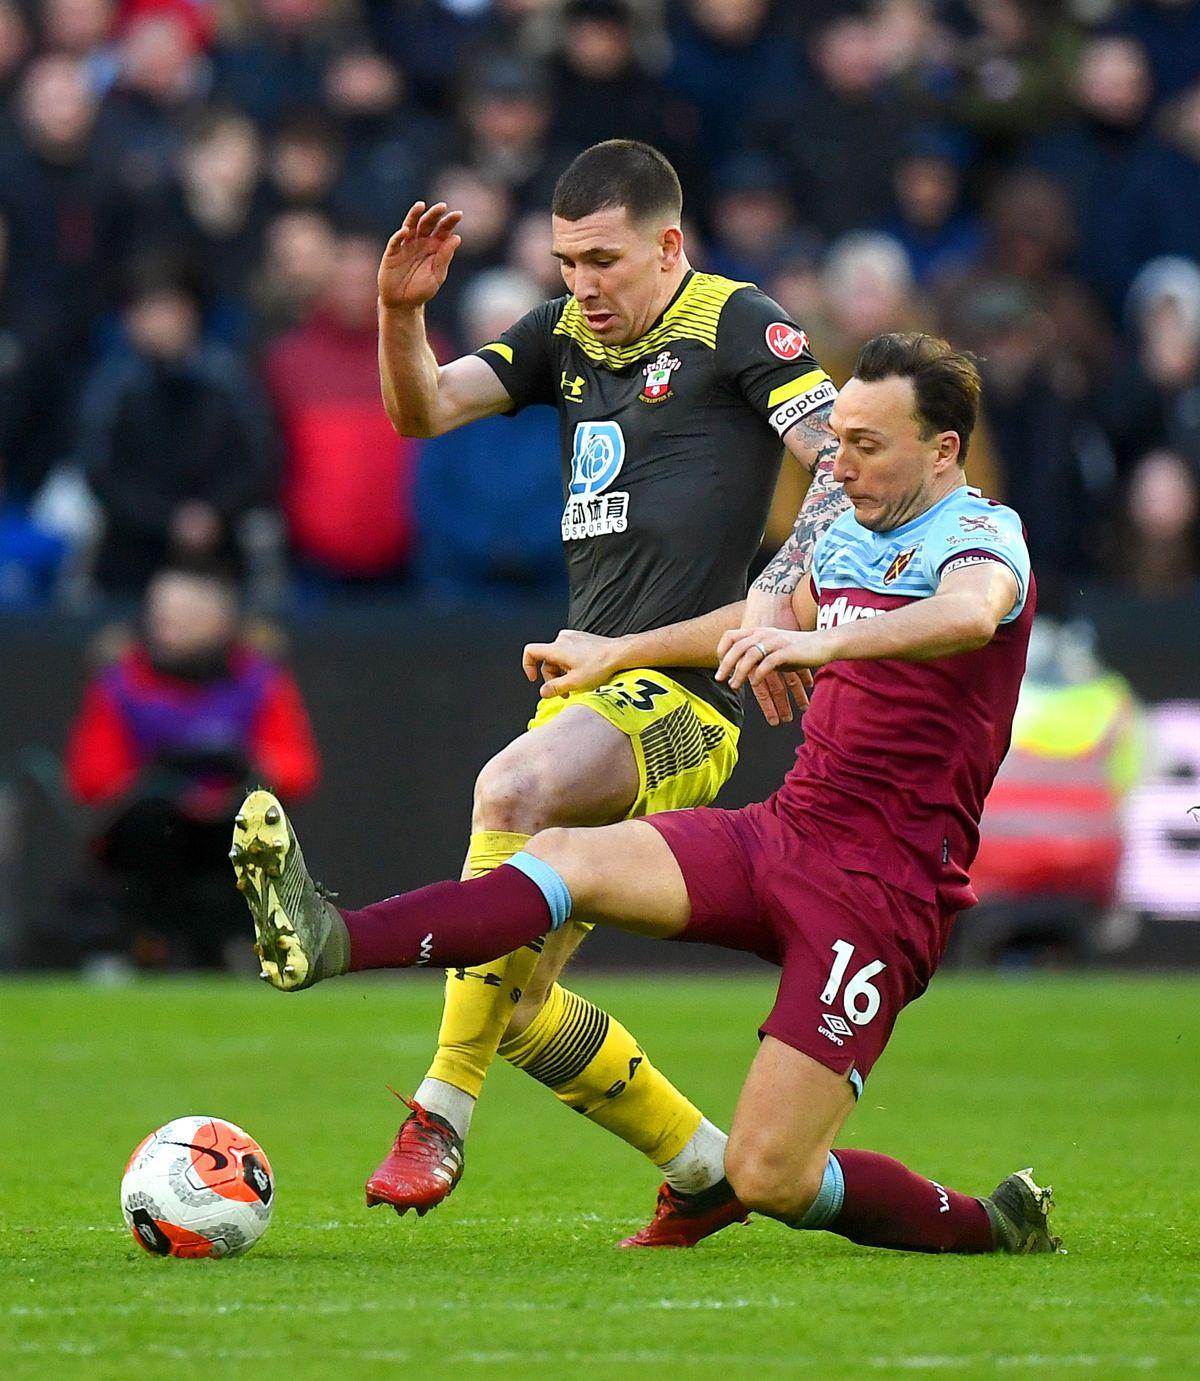 Southampton captain Pierre Emil Hojbjerg challenges West Ham's Mark Noble for the ball Premier League contract